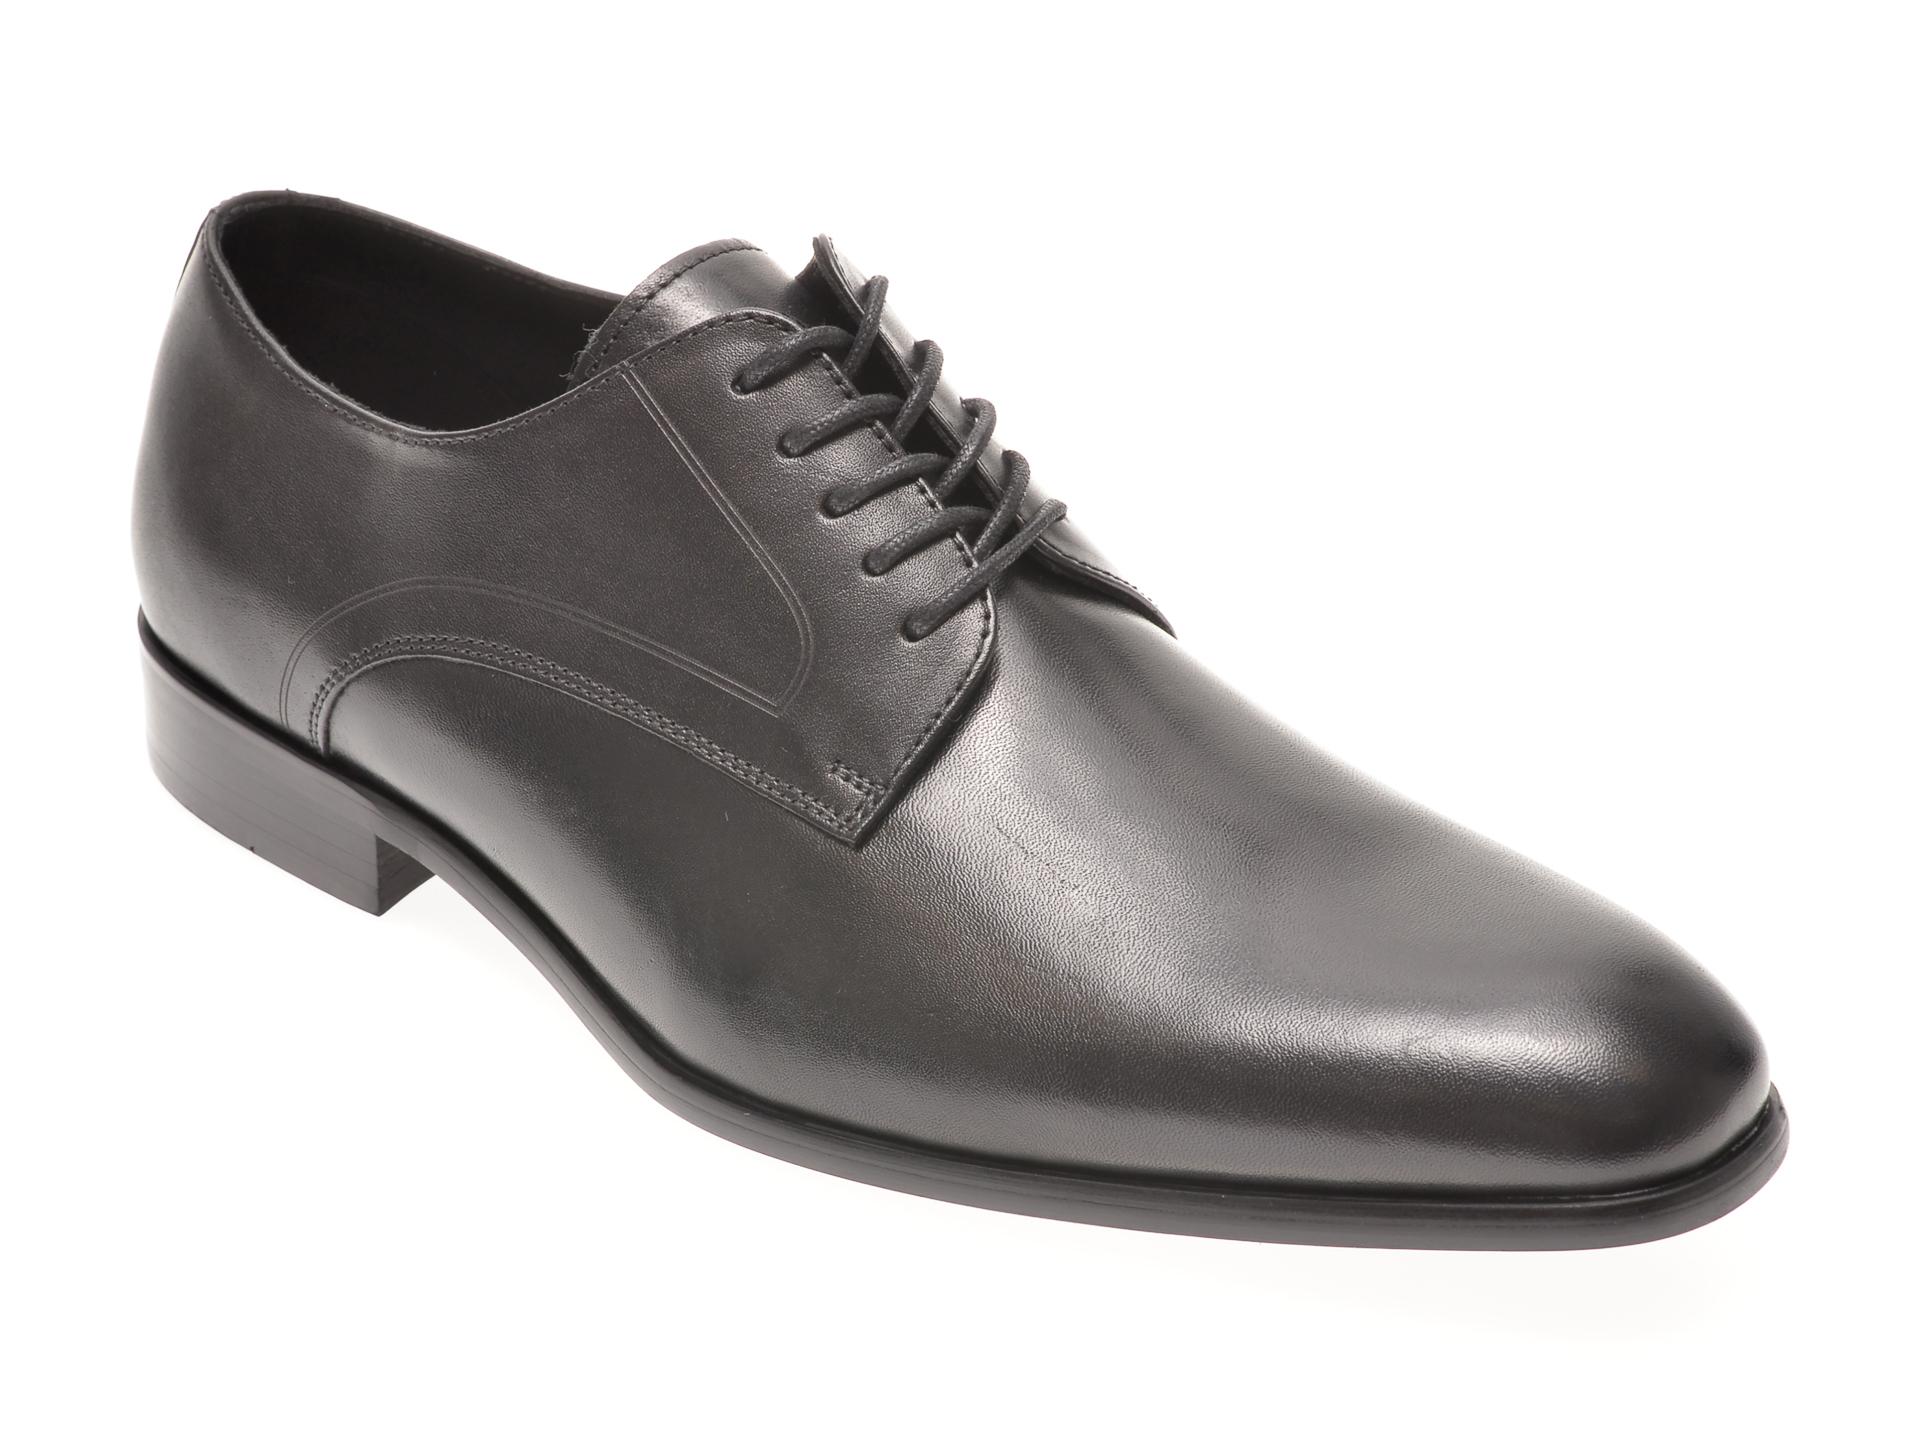 Pantofi Aldo Negri, Proven001, Din Piele Naturala